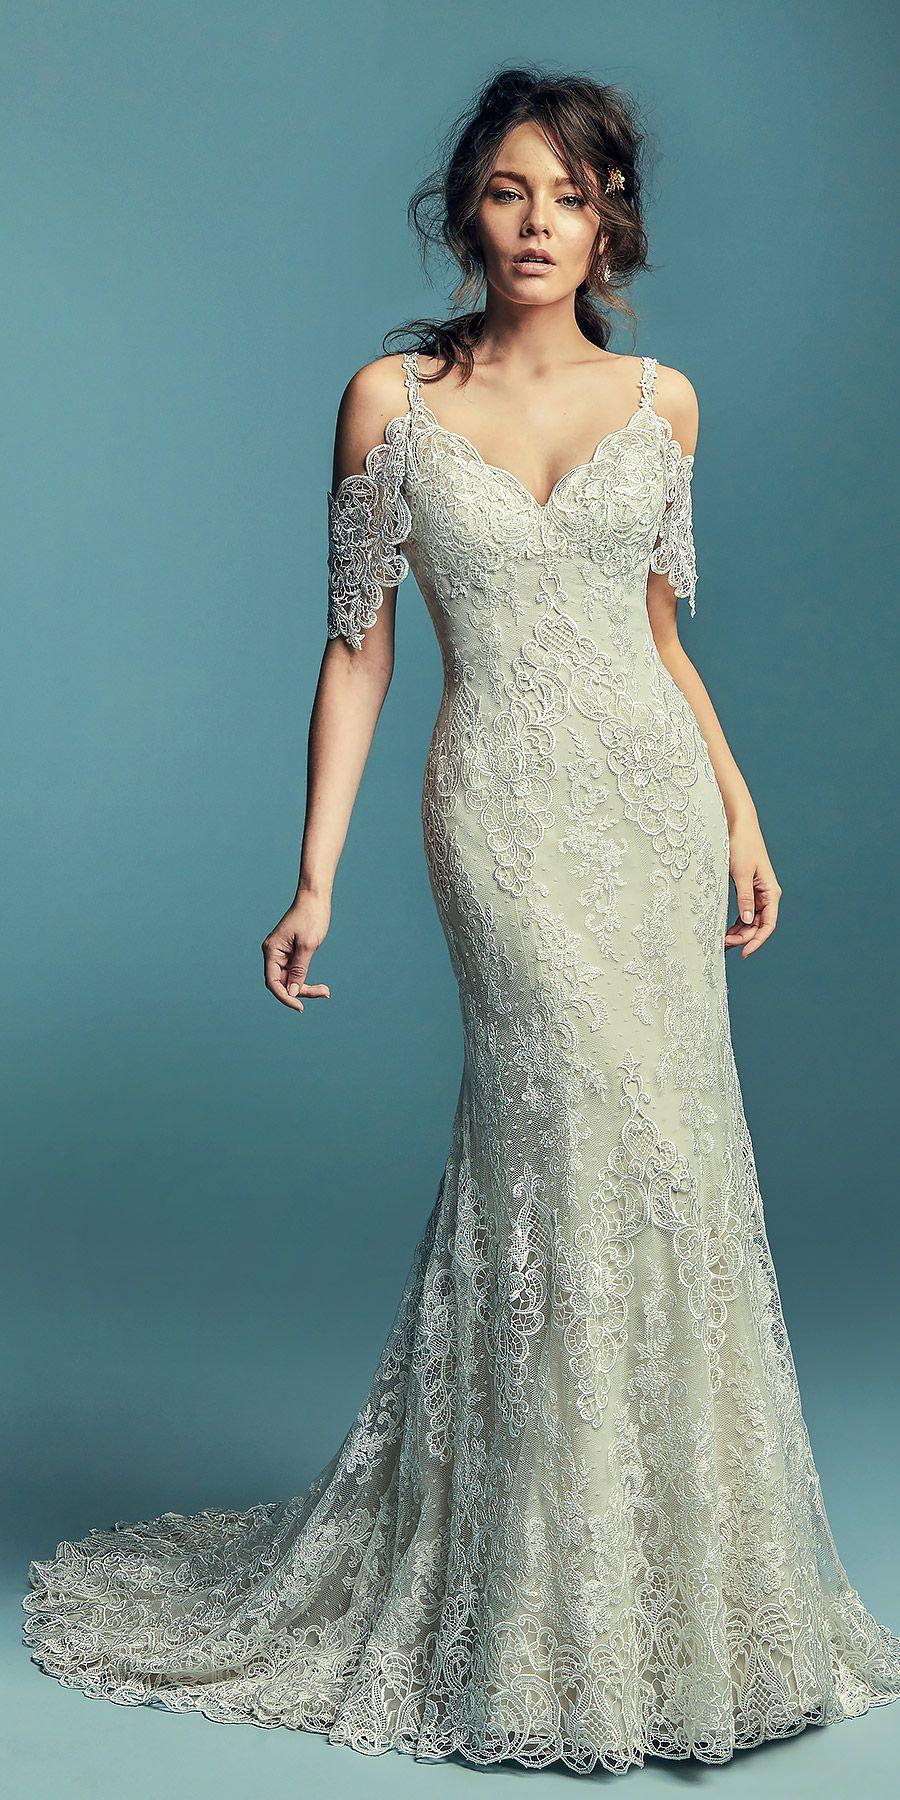 Elliana By Maggie Sottero Wedding Dresses Maggie Sottero Wedding Dresses Cold Shoulder Wedding Dress Sottero Wedding Dress